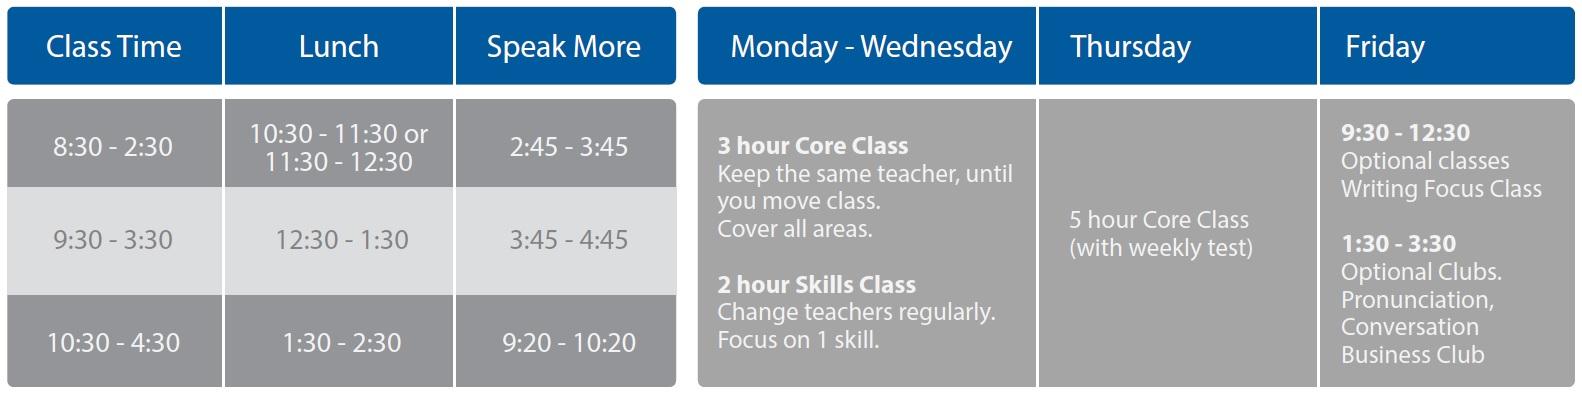 GE timetable